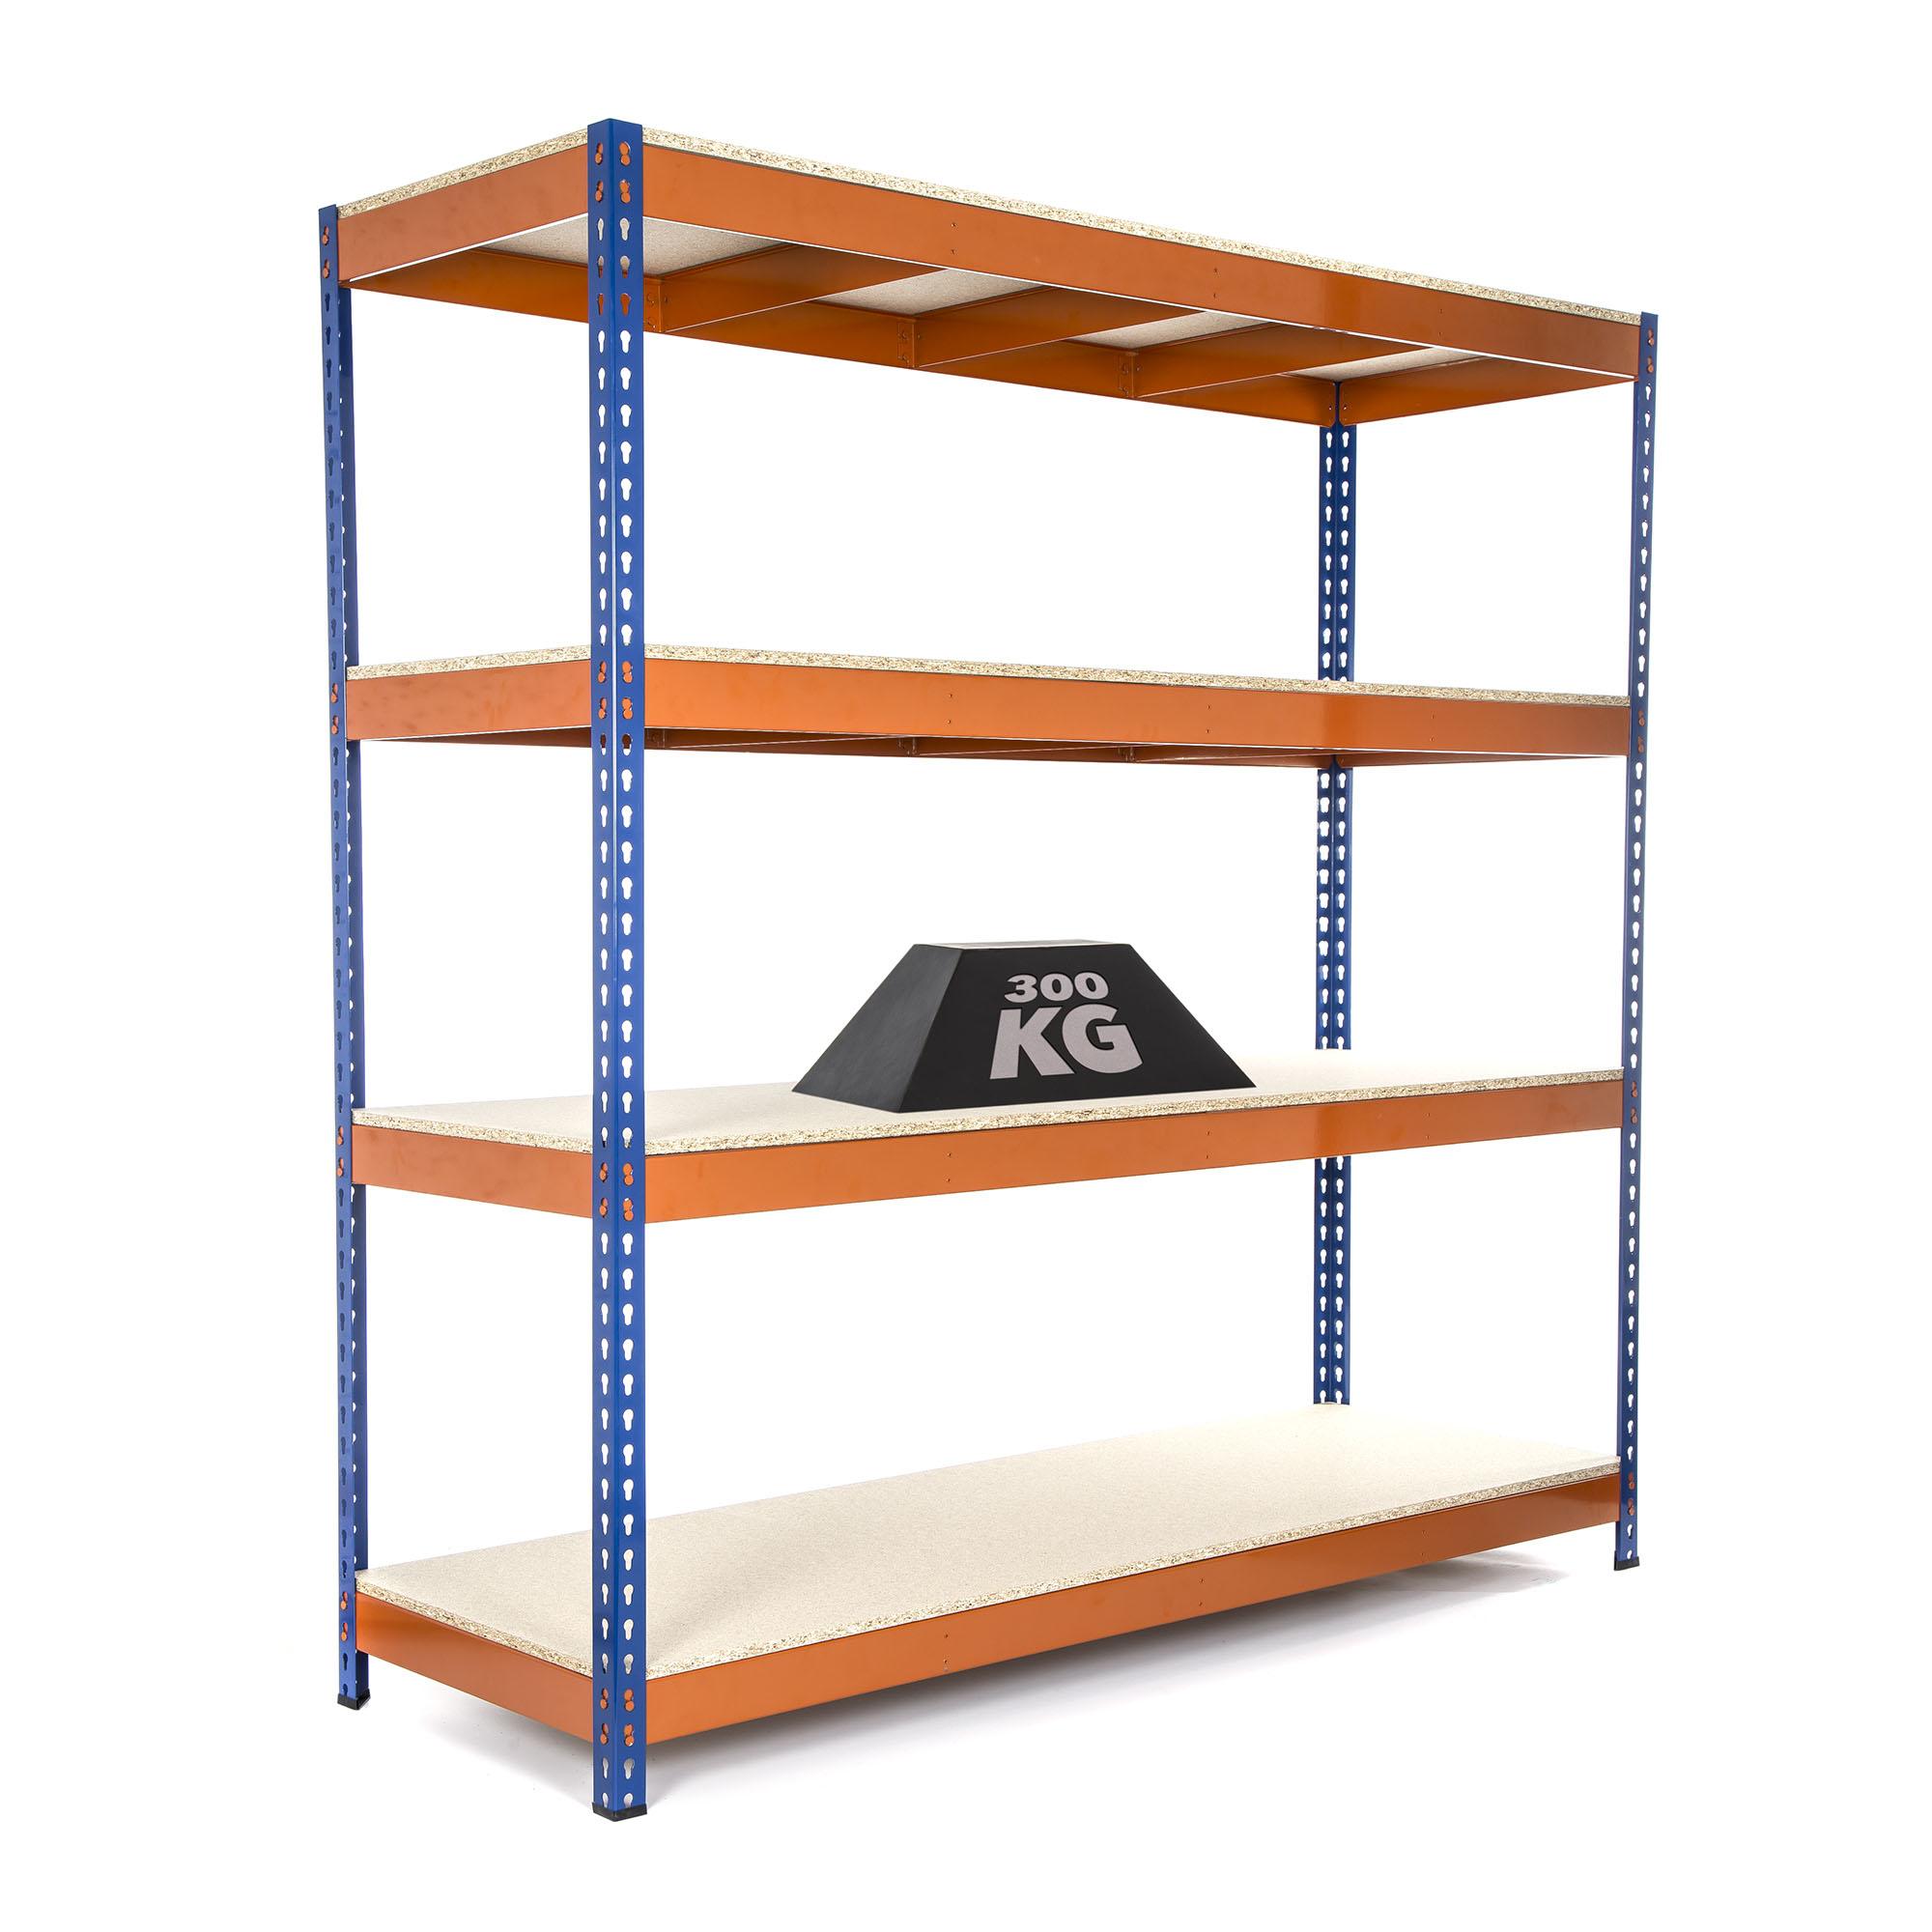 Medium Racking suitable for Home, Garages, Workshop Storage etc - Assembly Instructions